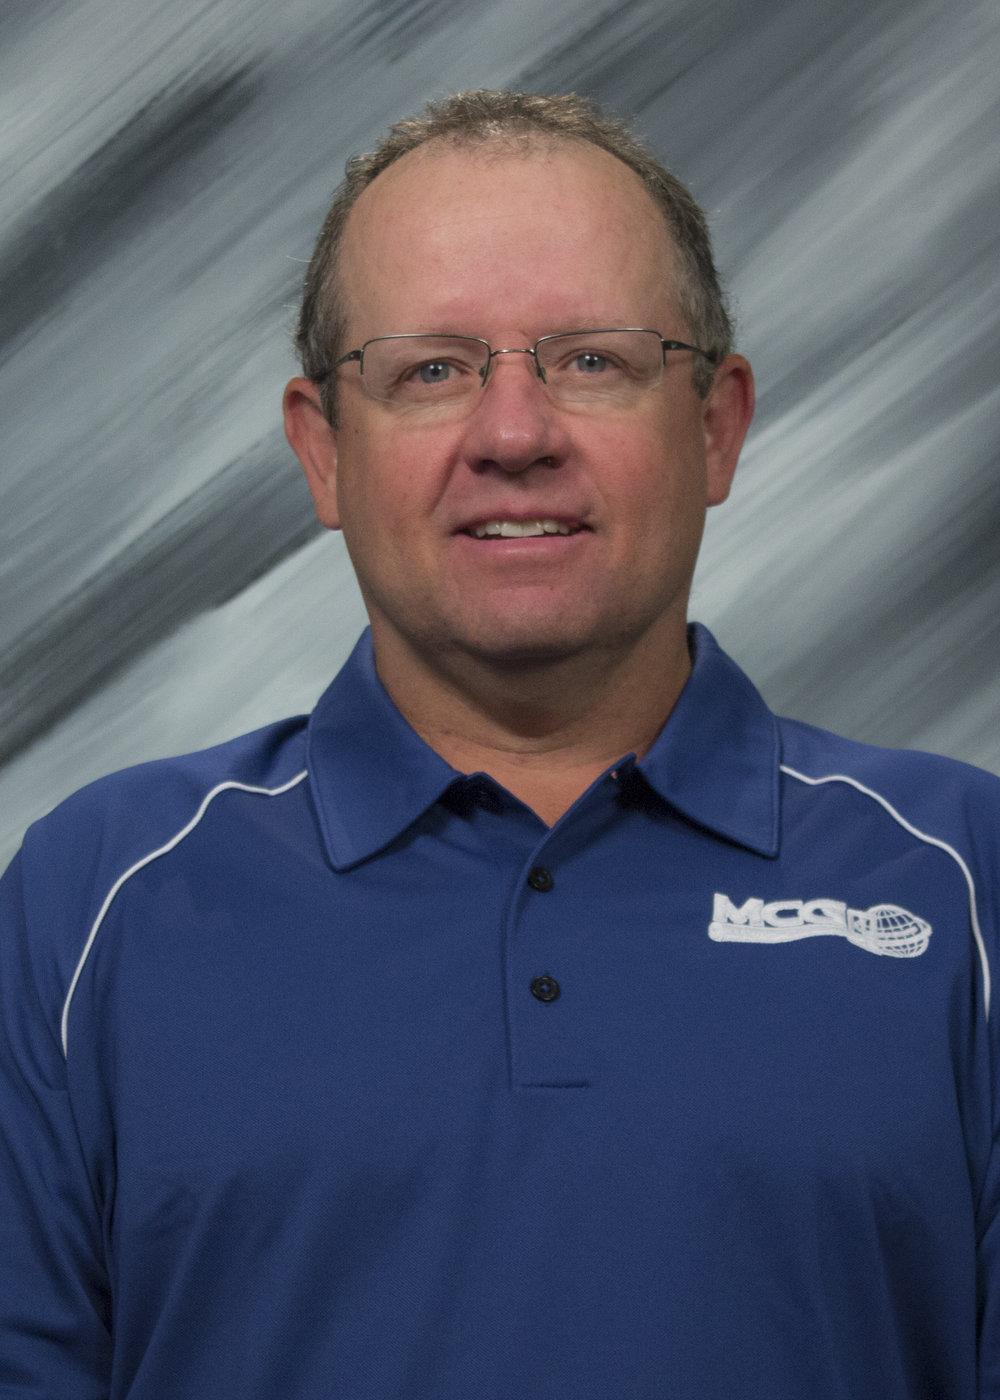 Frank Hansen, General Manager